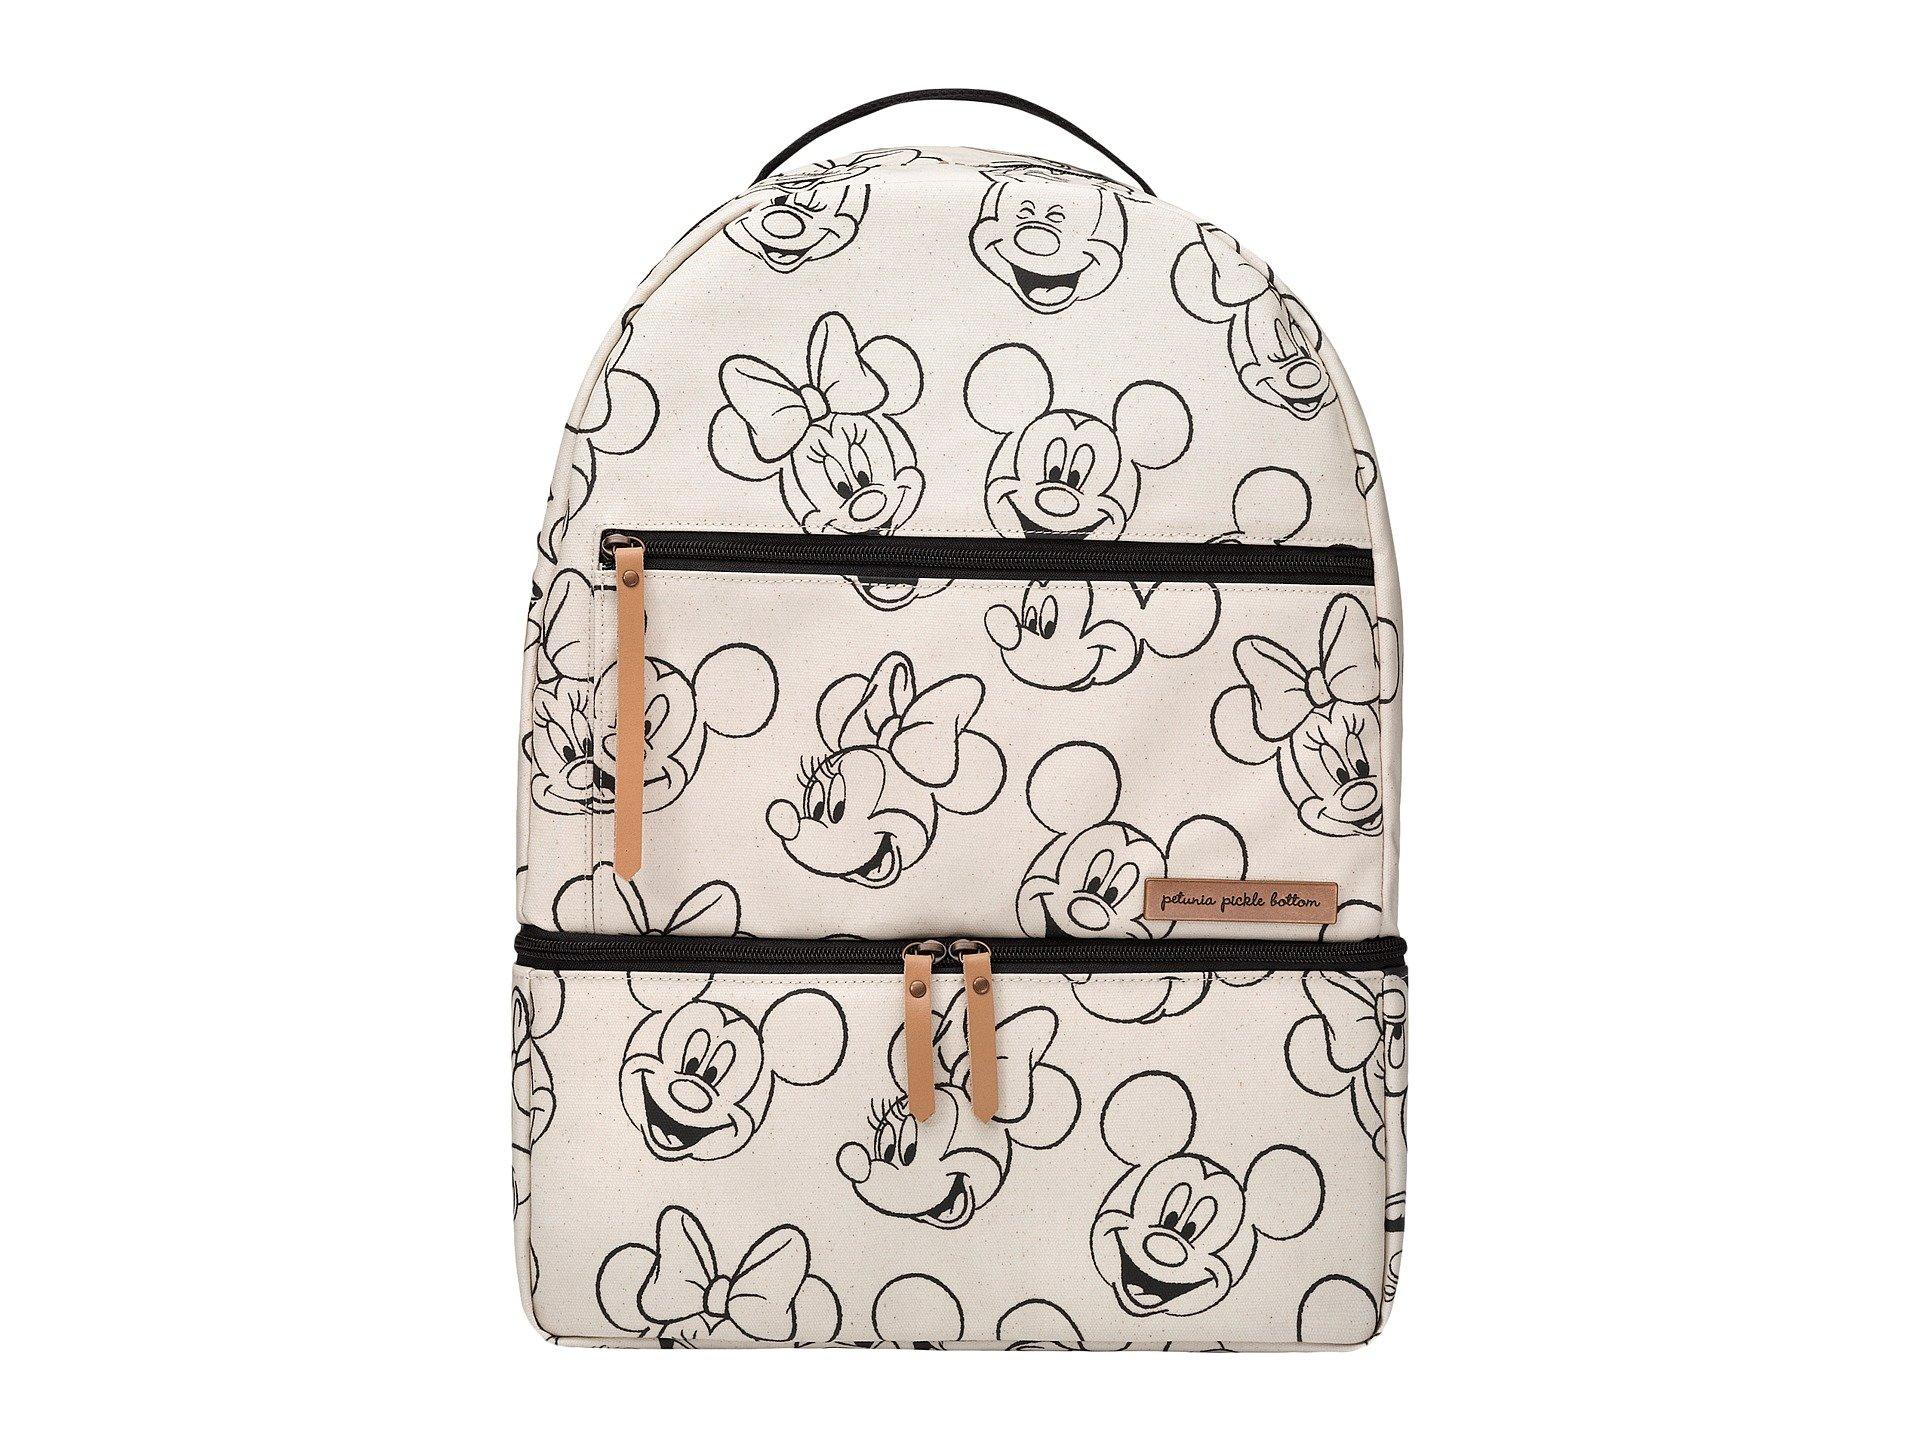 Petunia Pickle Bottom Axis Backpack, Sketchbook Mickey & Minnie